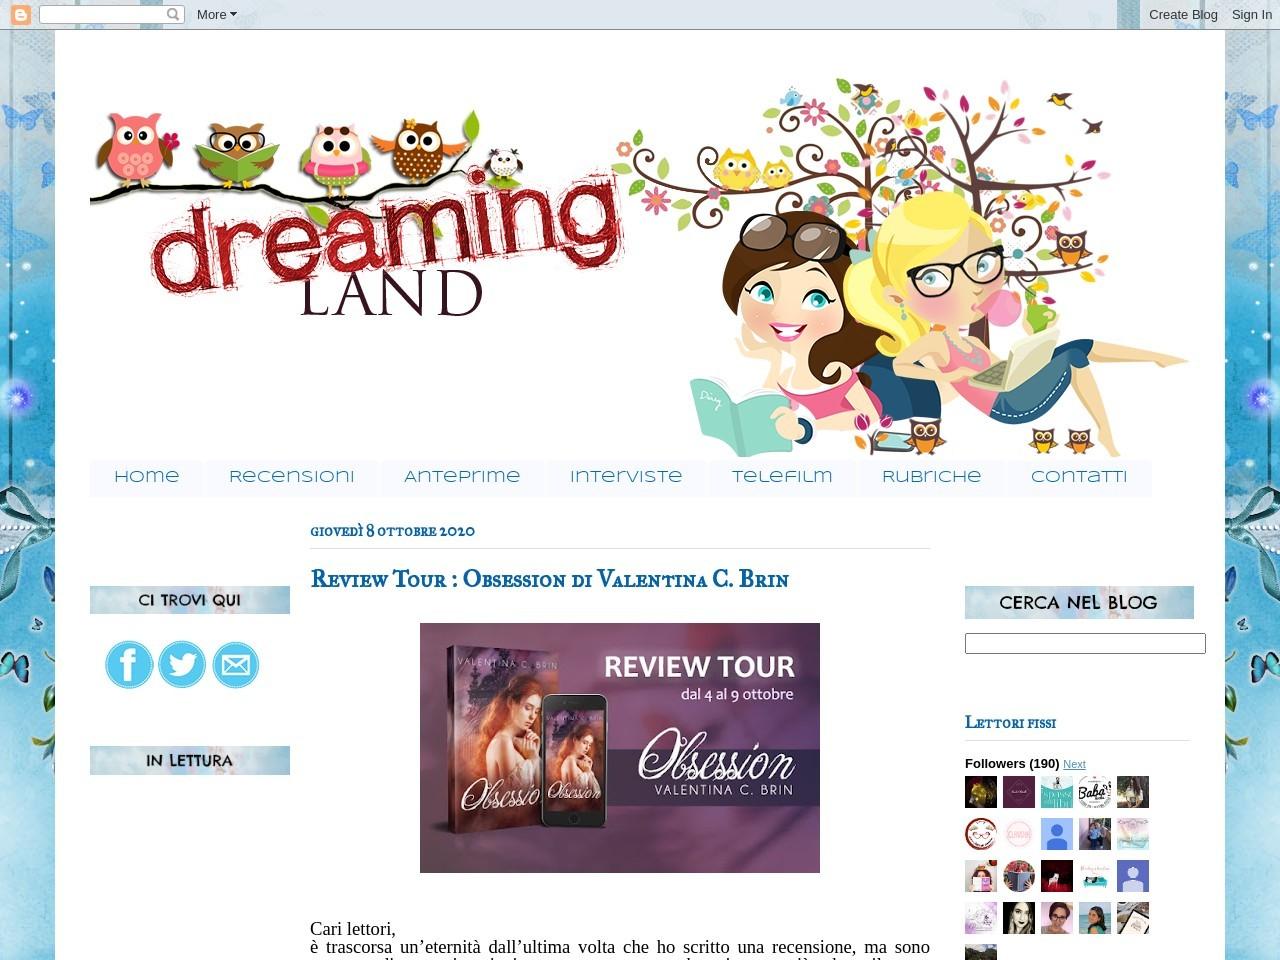 dreaming-land